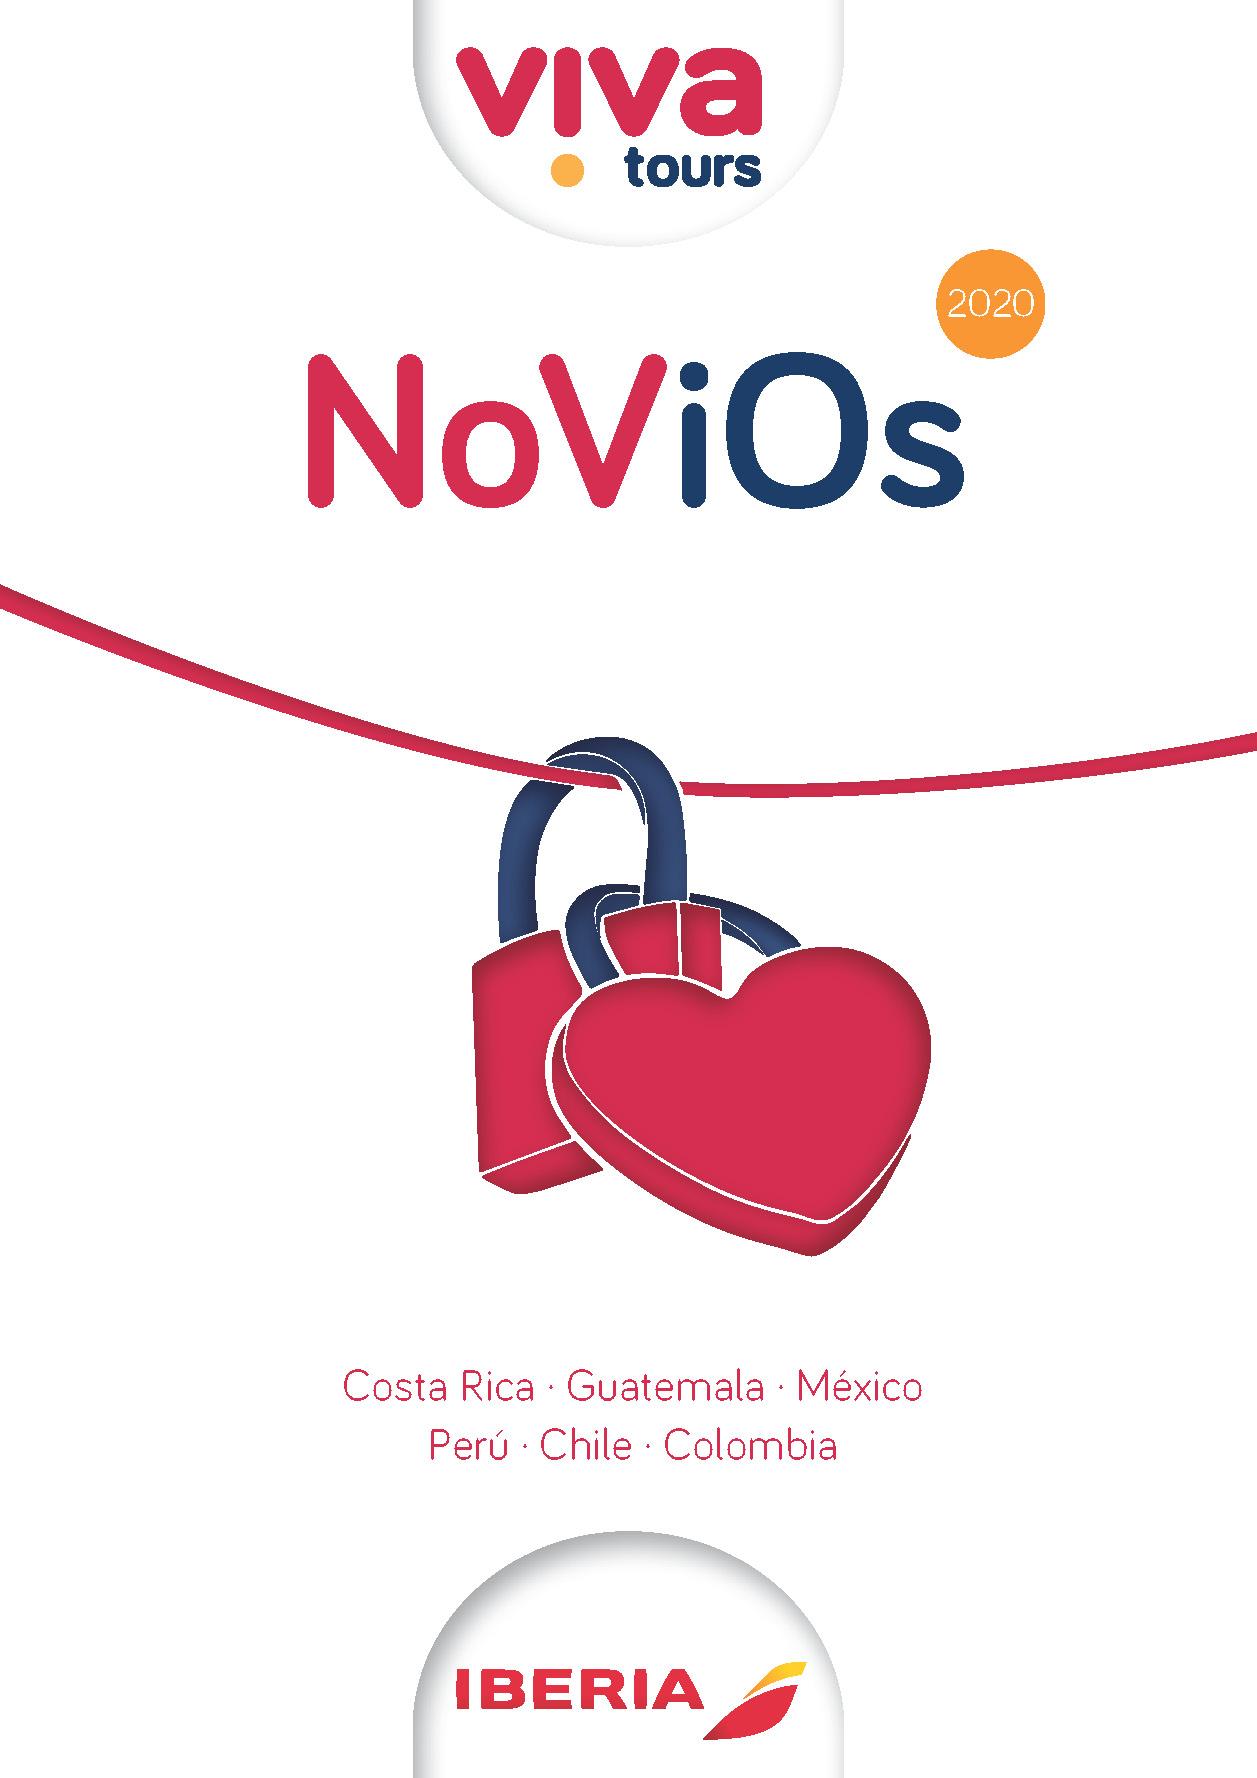 Catalogo Viva Tours Novios 2020